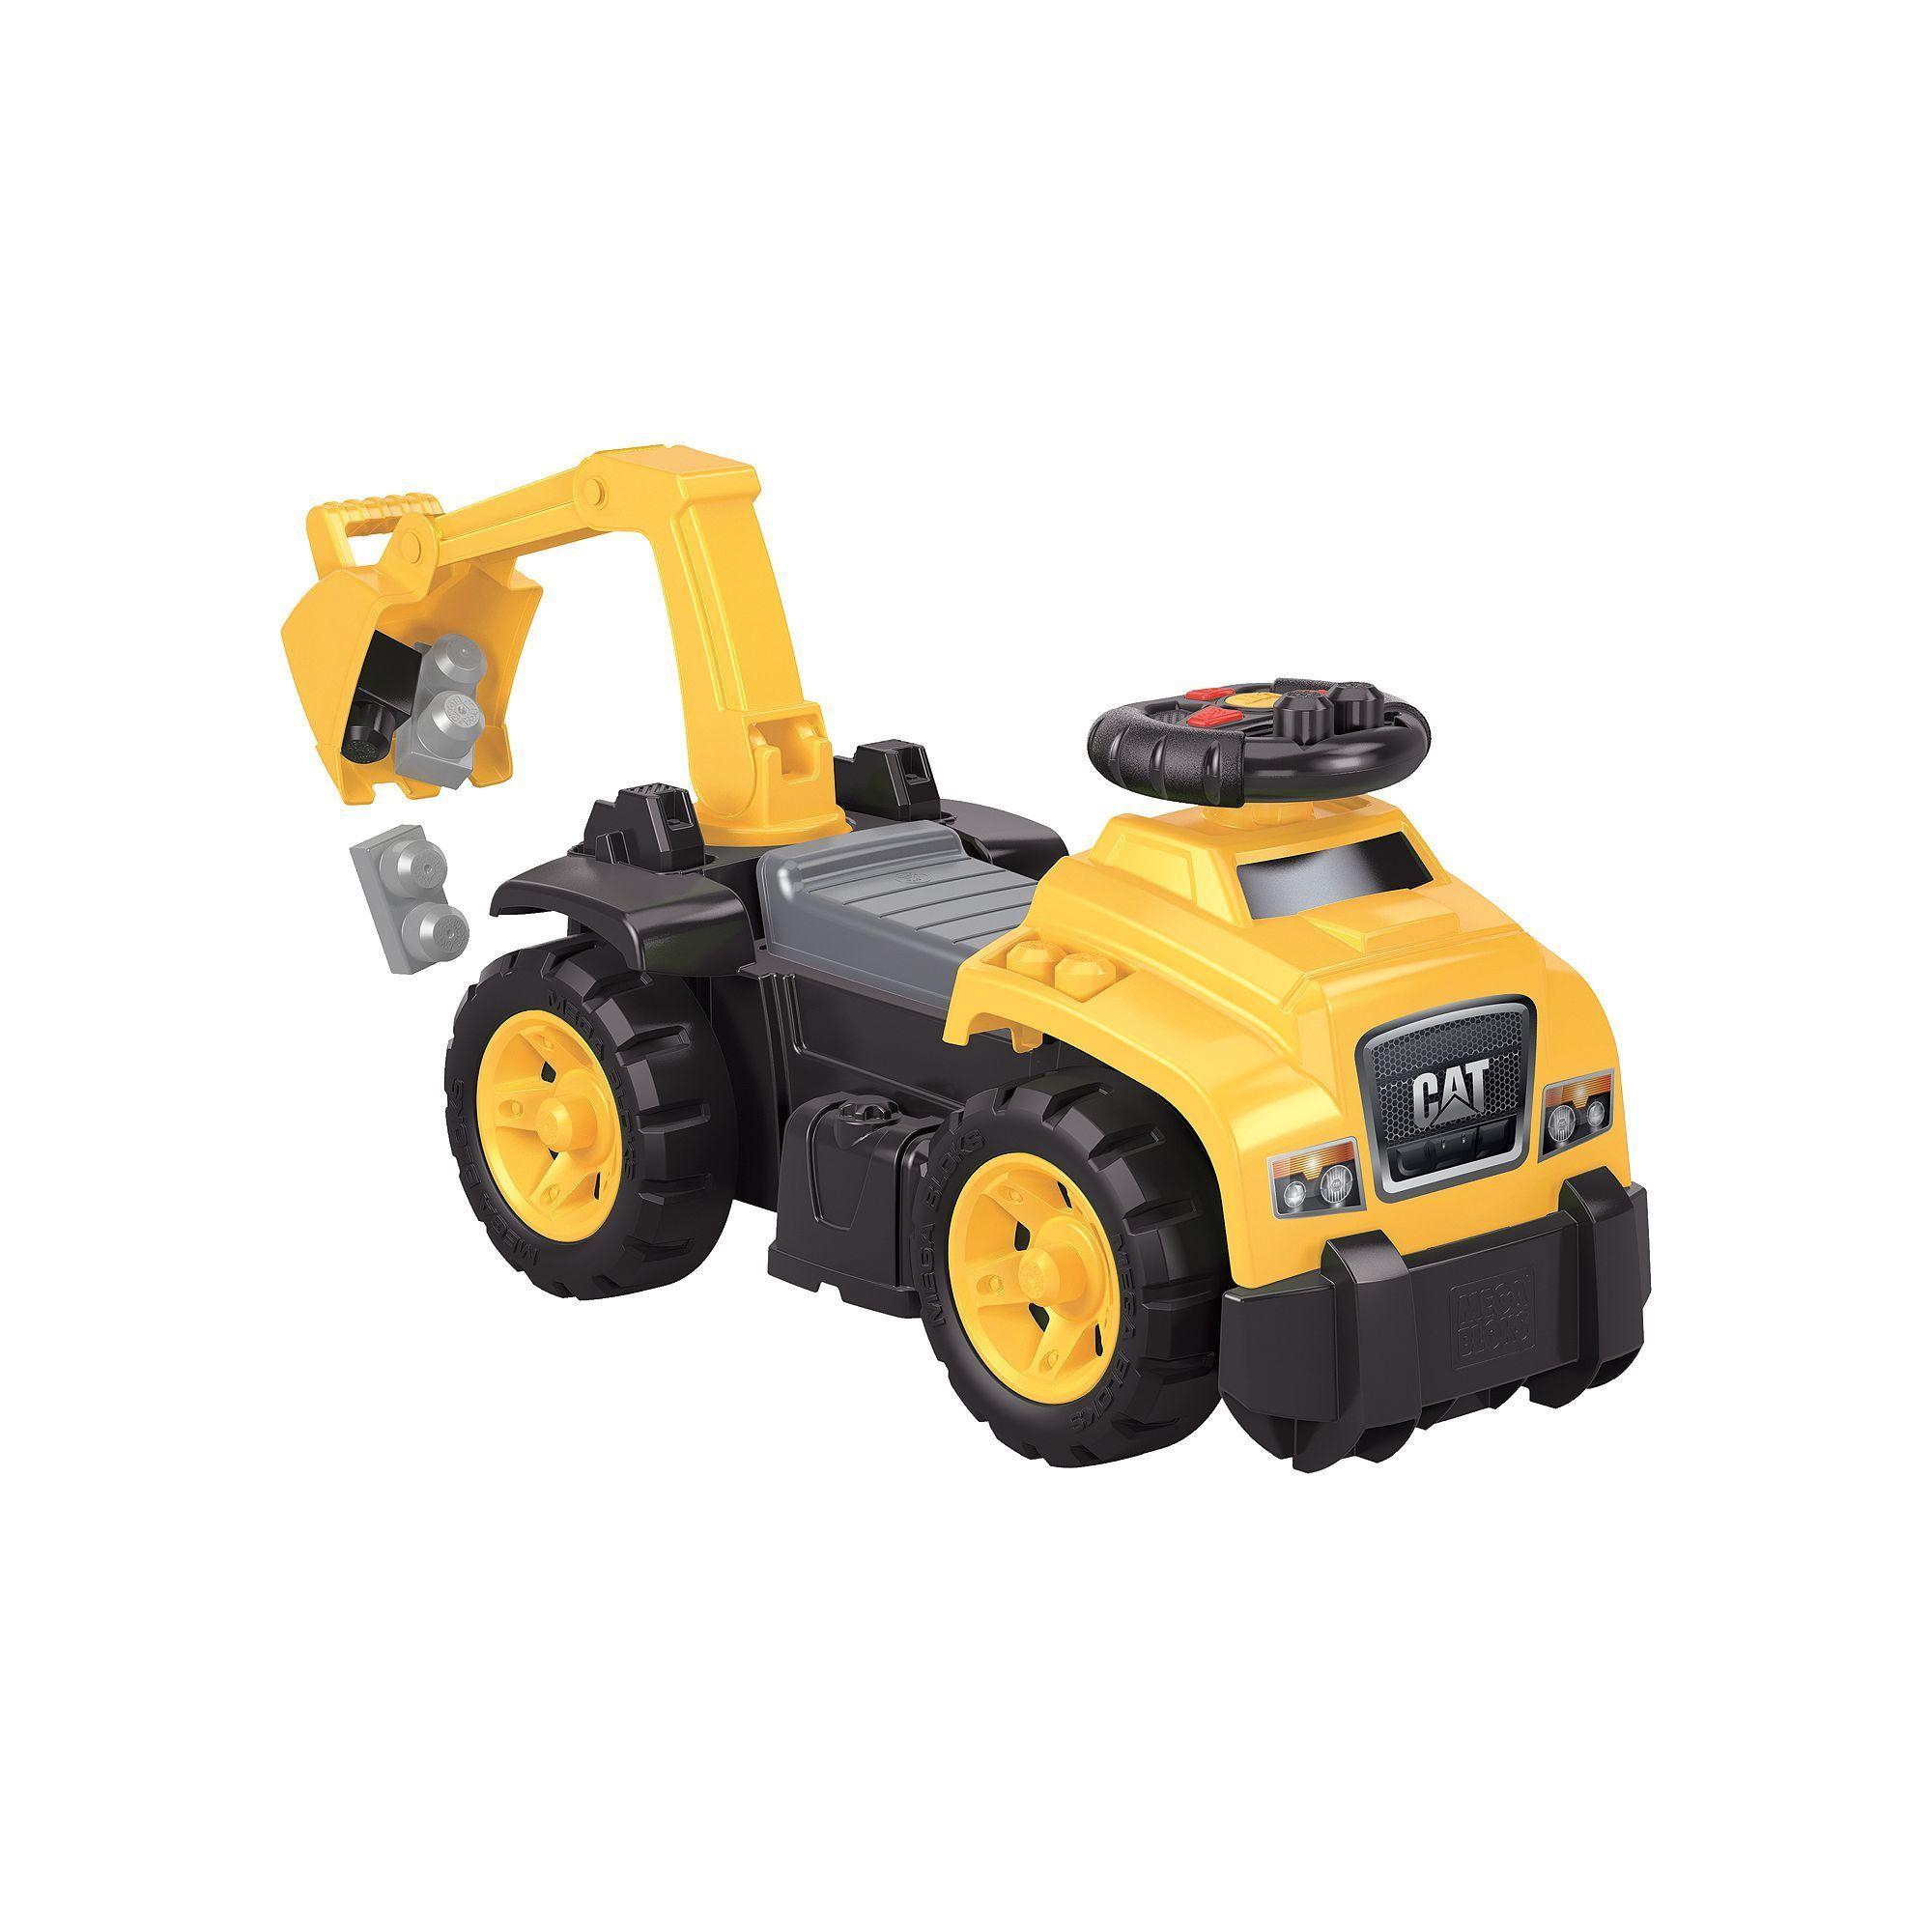 Car 3 toys  Mega Bloks First Builders CAT in RideOn Multicolor  Hard hats